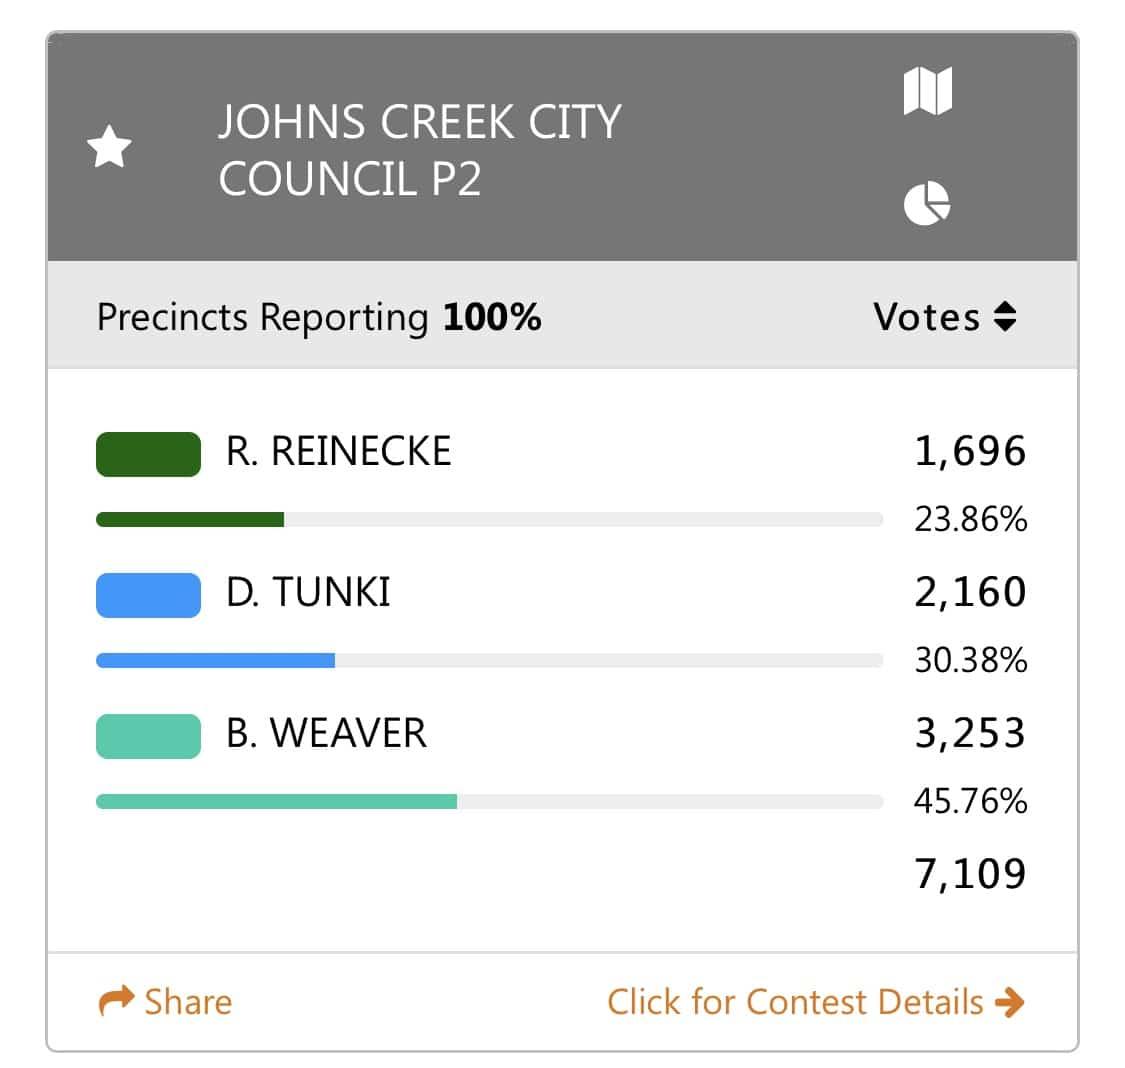 Johns Creek City Council Post 2 Results